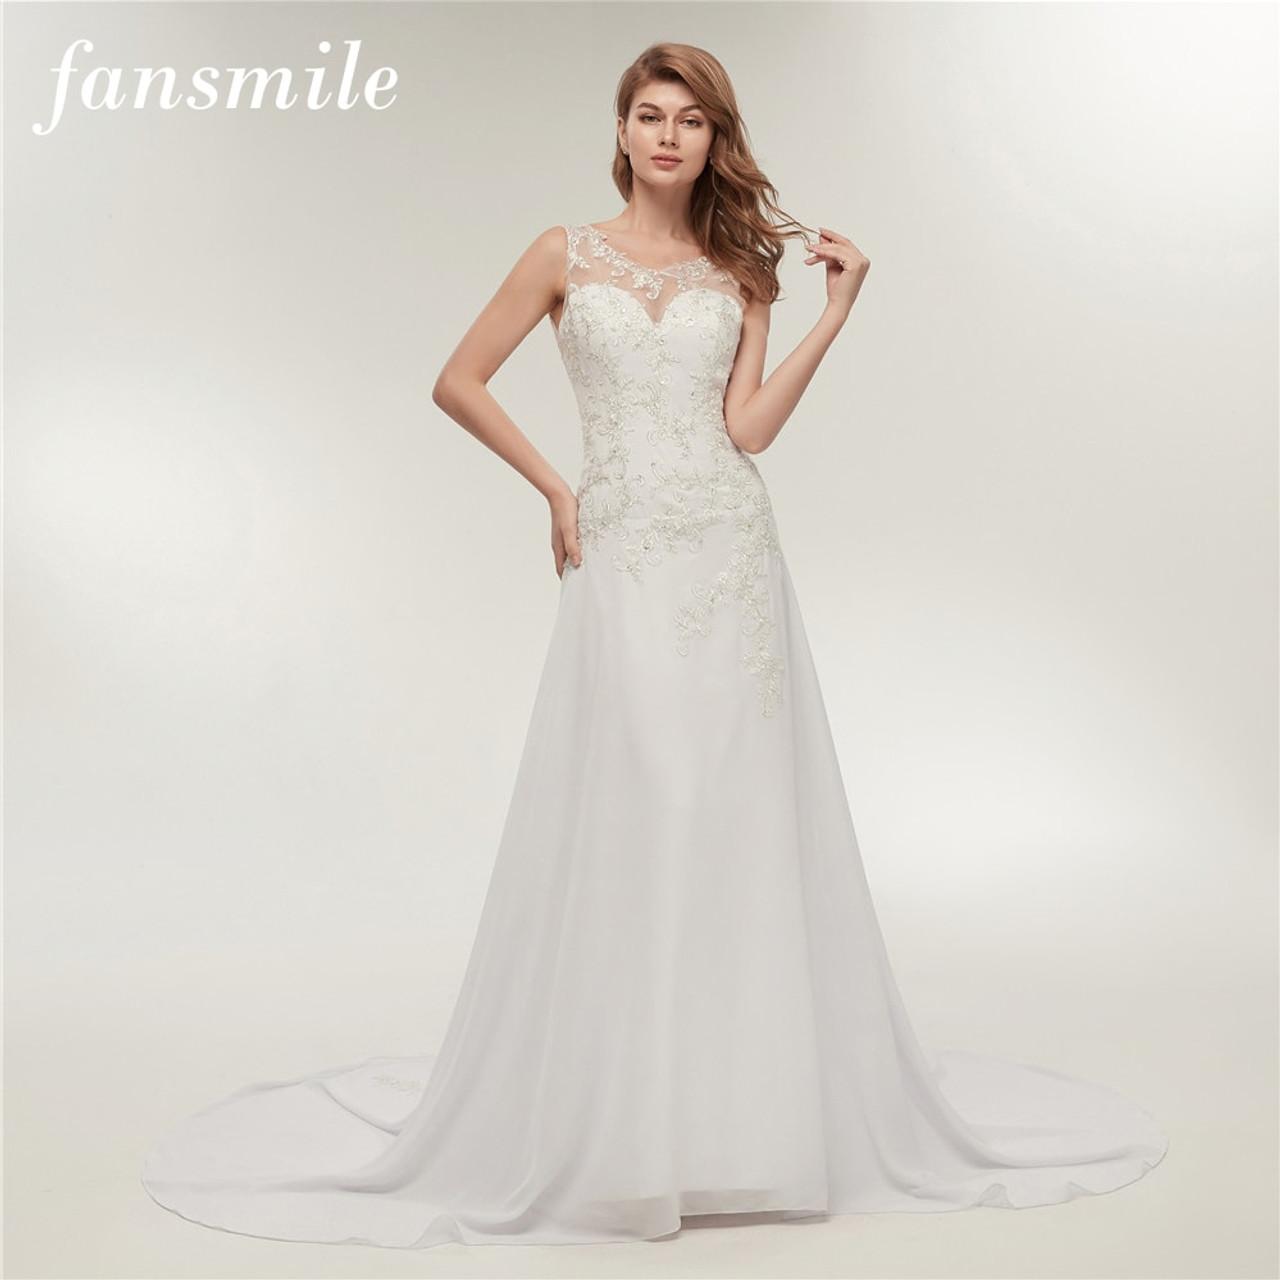 Fansmile Real Photo Embroidery Chiffon Beach Wedding Dress 2019 Vestidos De Novia Plus Size Bridal Gowns Fsm 237m